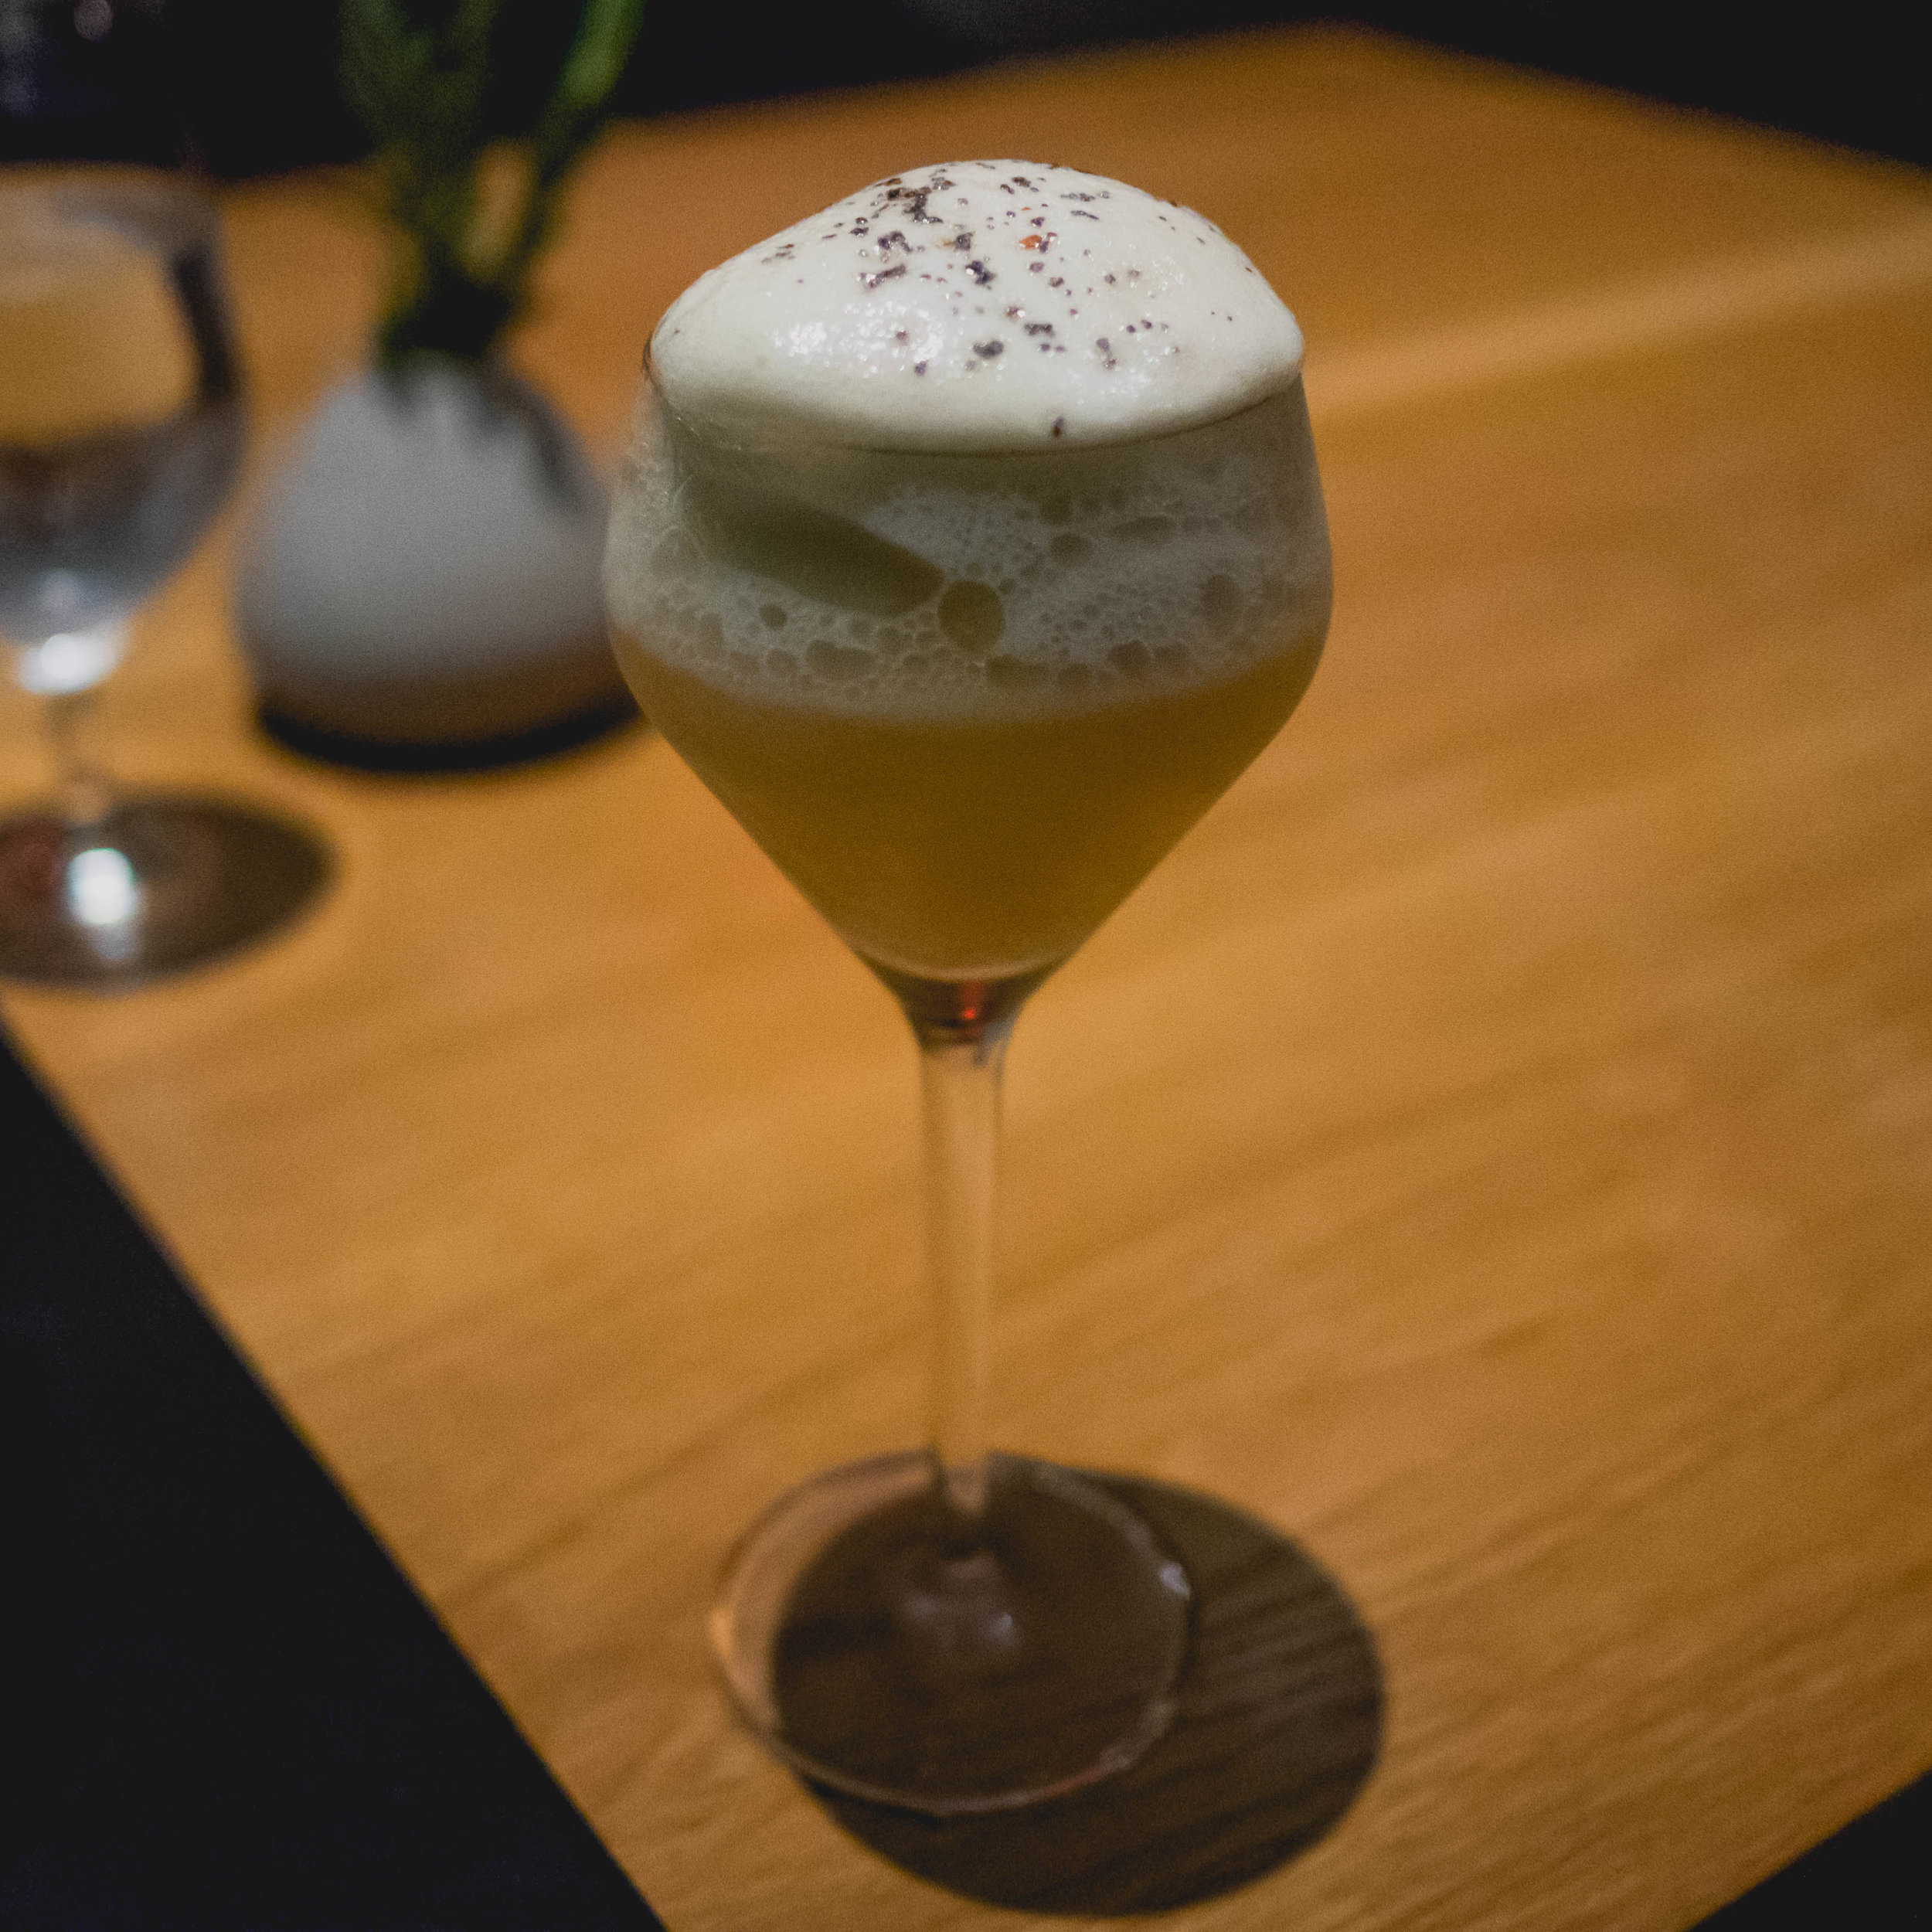 silver lake: brugal rum, lie juice, smoked tamarind cordial, jasmine tea sea salt foam.